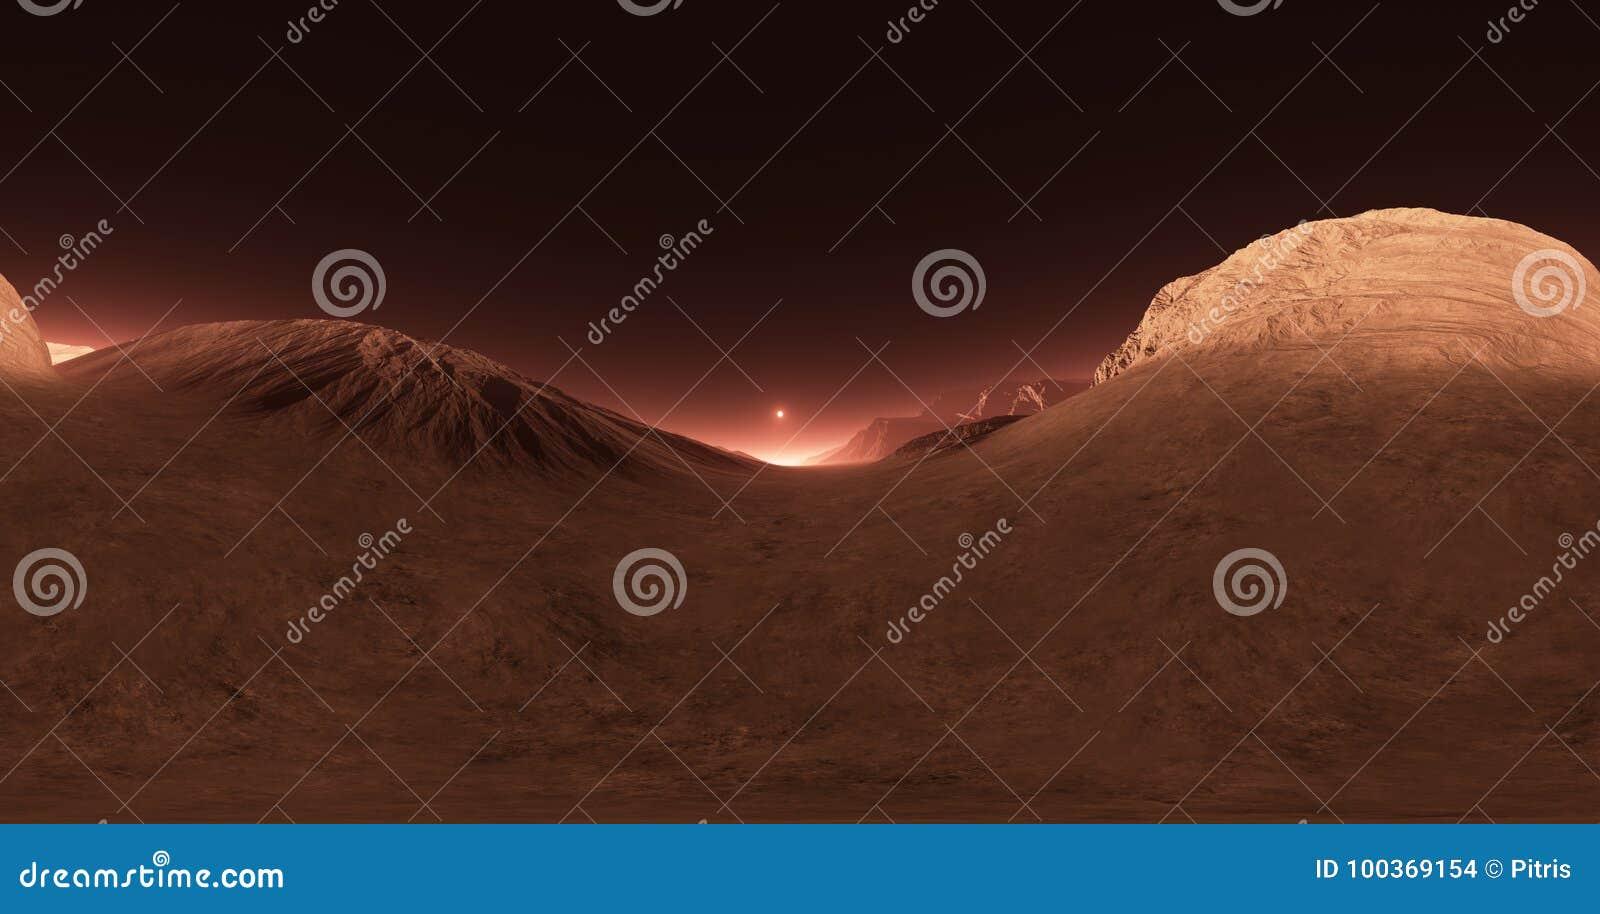 Панорама захода солнца Марса, карты окружающей среды HDRI Проекция Equirectangular, сферически панорама